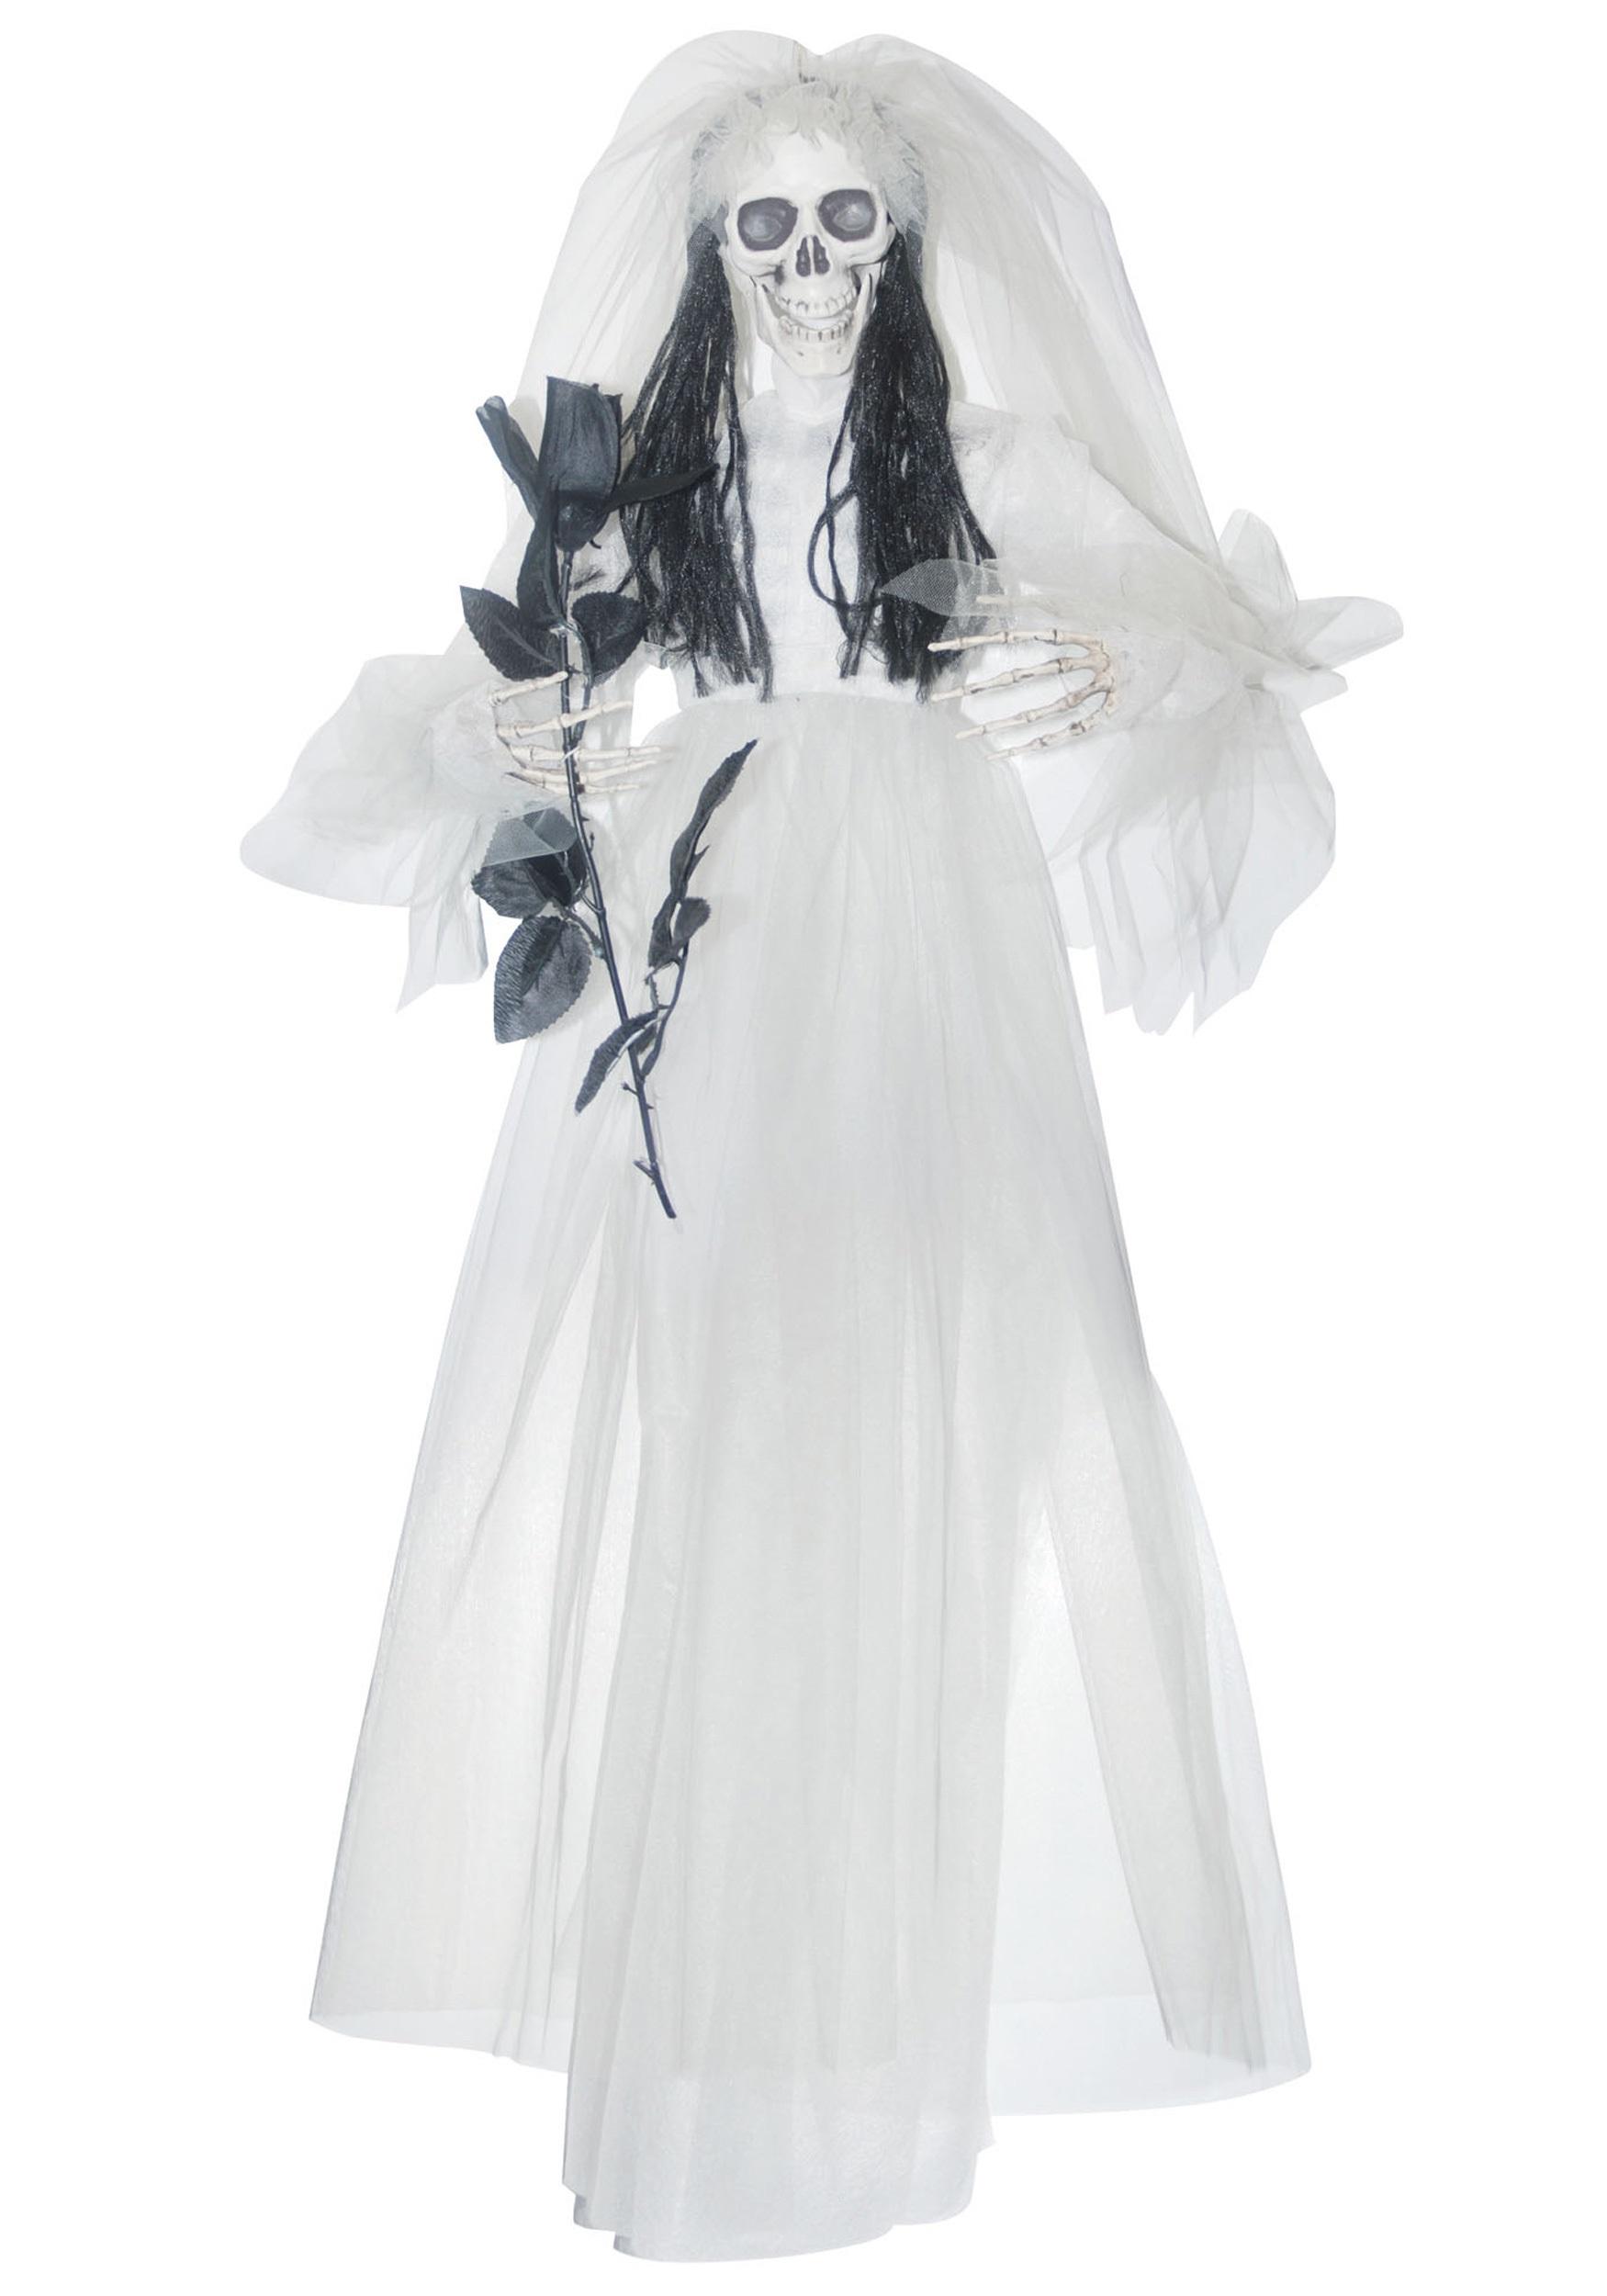 sc 1 st  Halloween Costumes & Hanging Bride w/ Black Rose